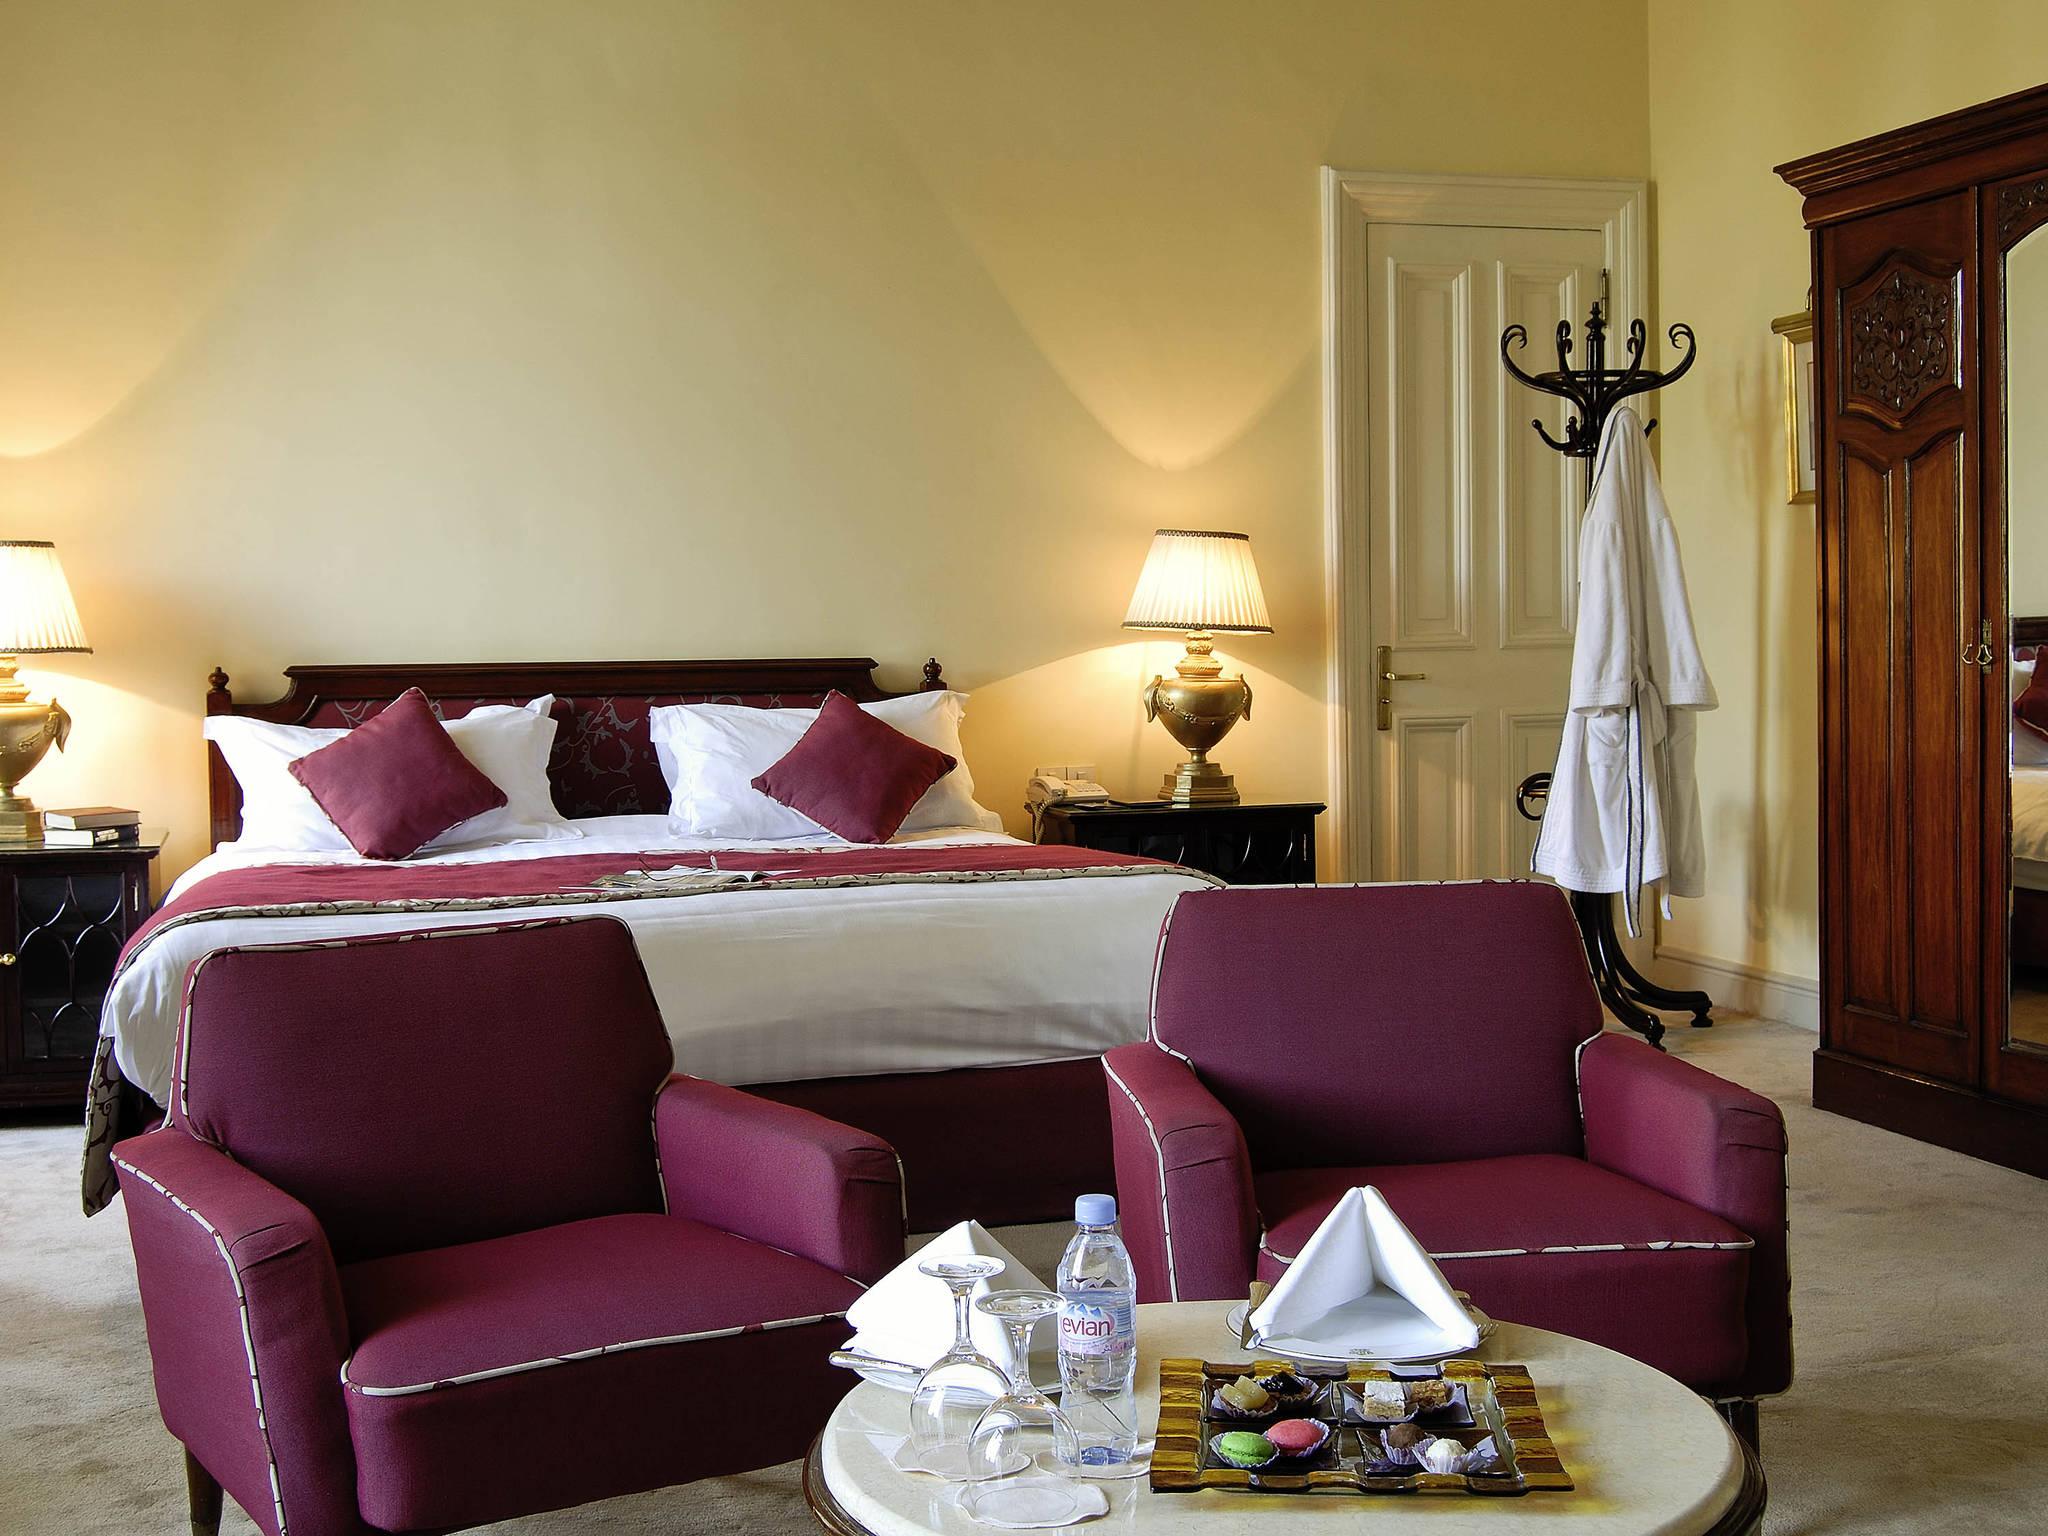 luxury-hotel-luxor-egypt